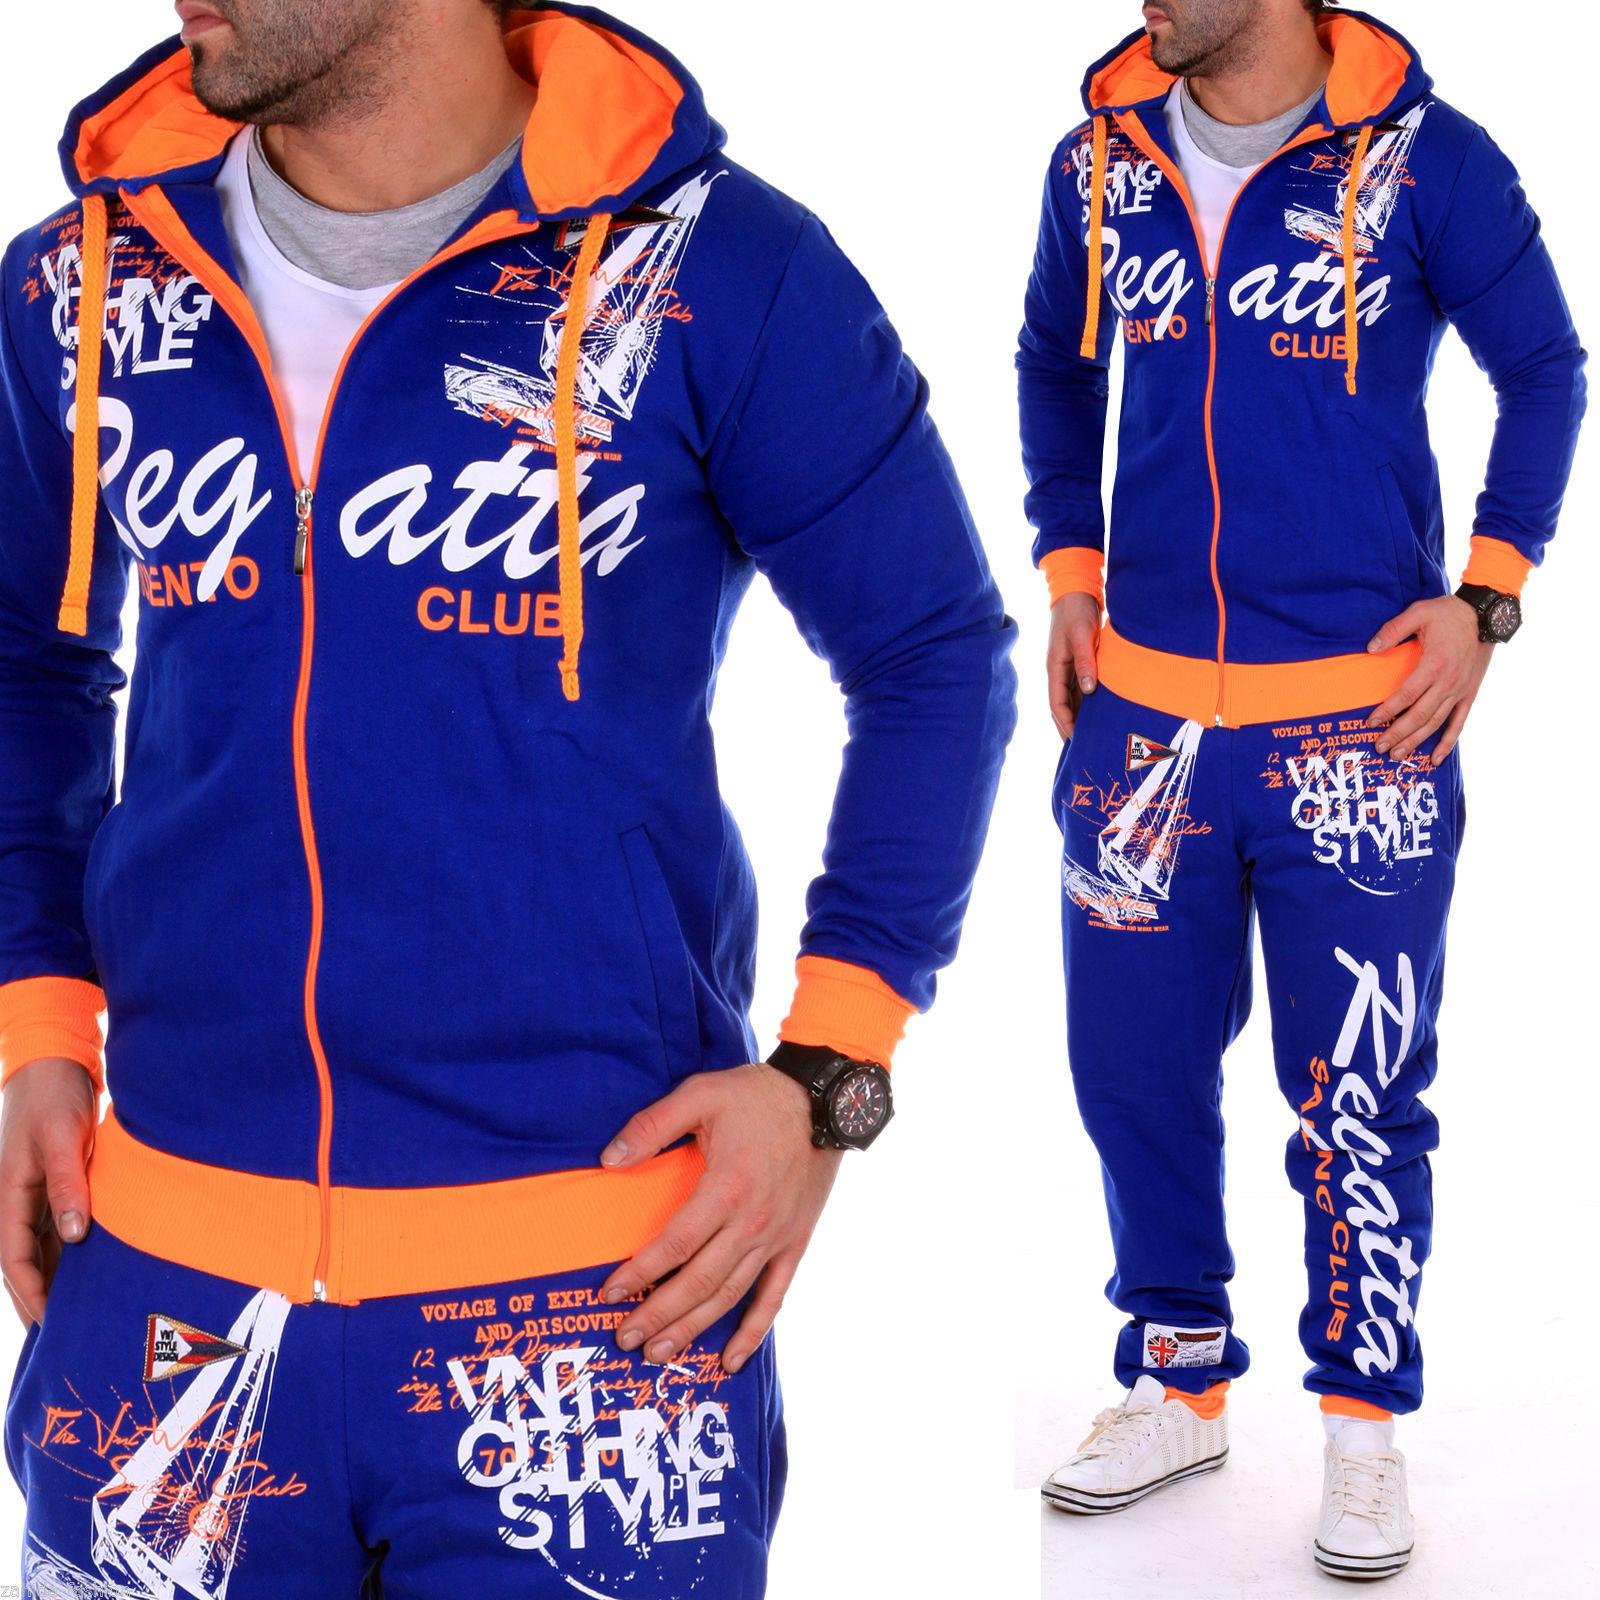 Herren Jogginganzug Jogging Jacke Hose Sportanzug Sportswear Laufen Jogger NEU